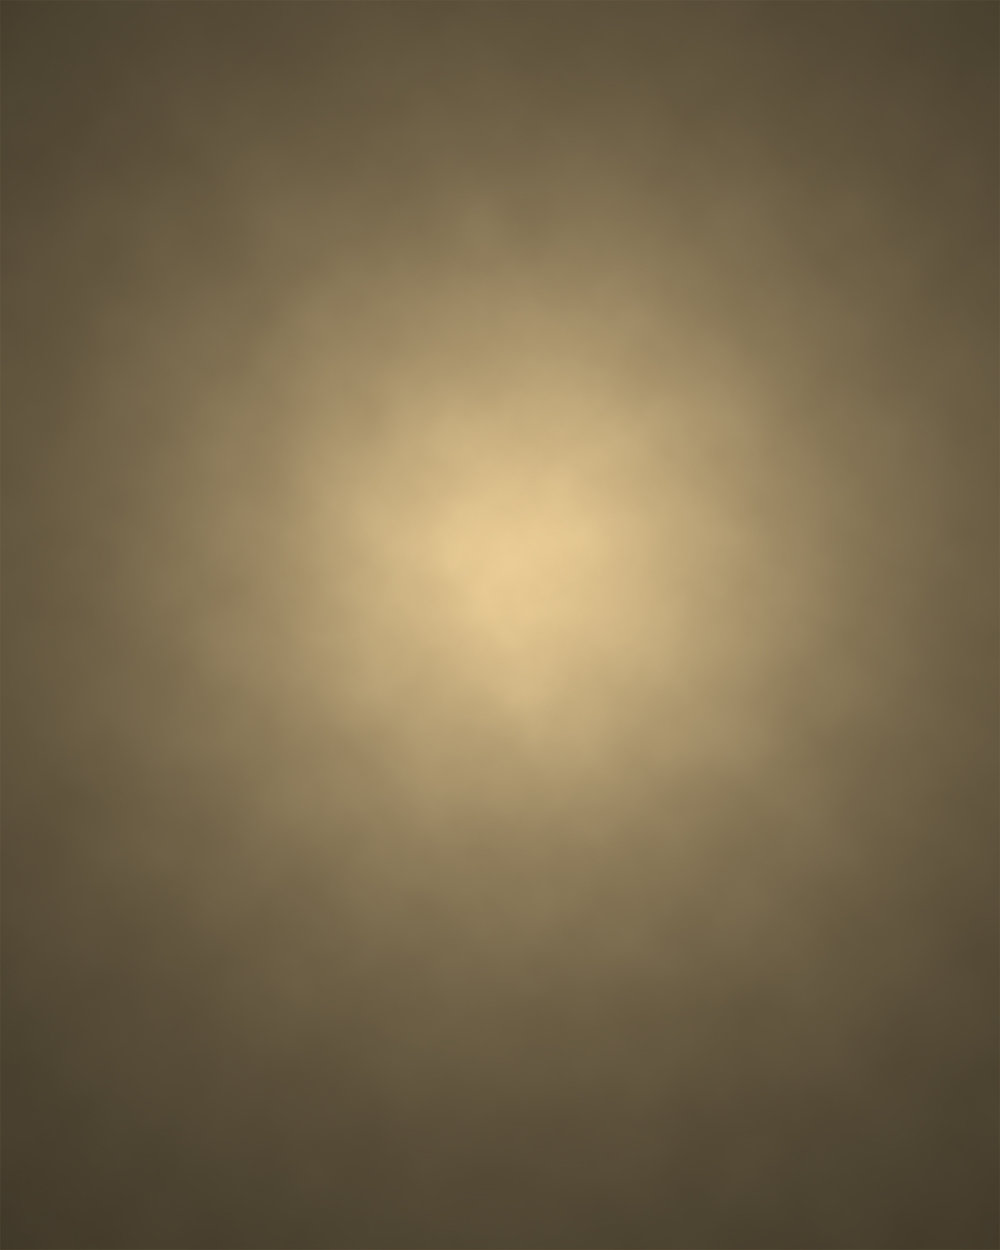 Background Option #8 - Gold/Tan